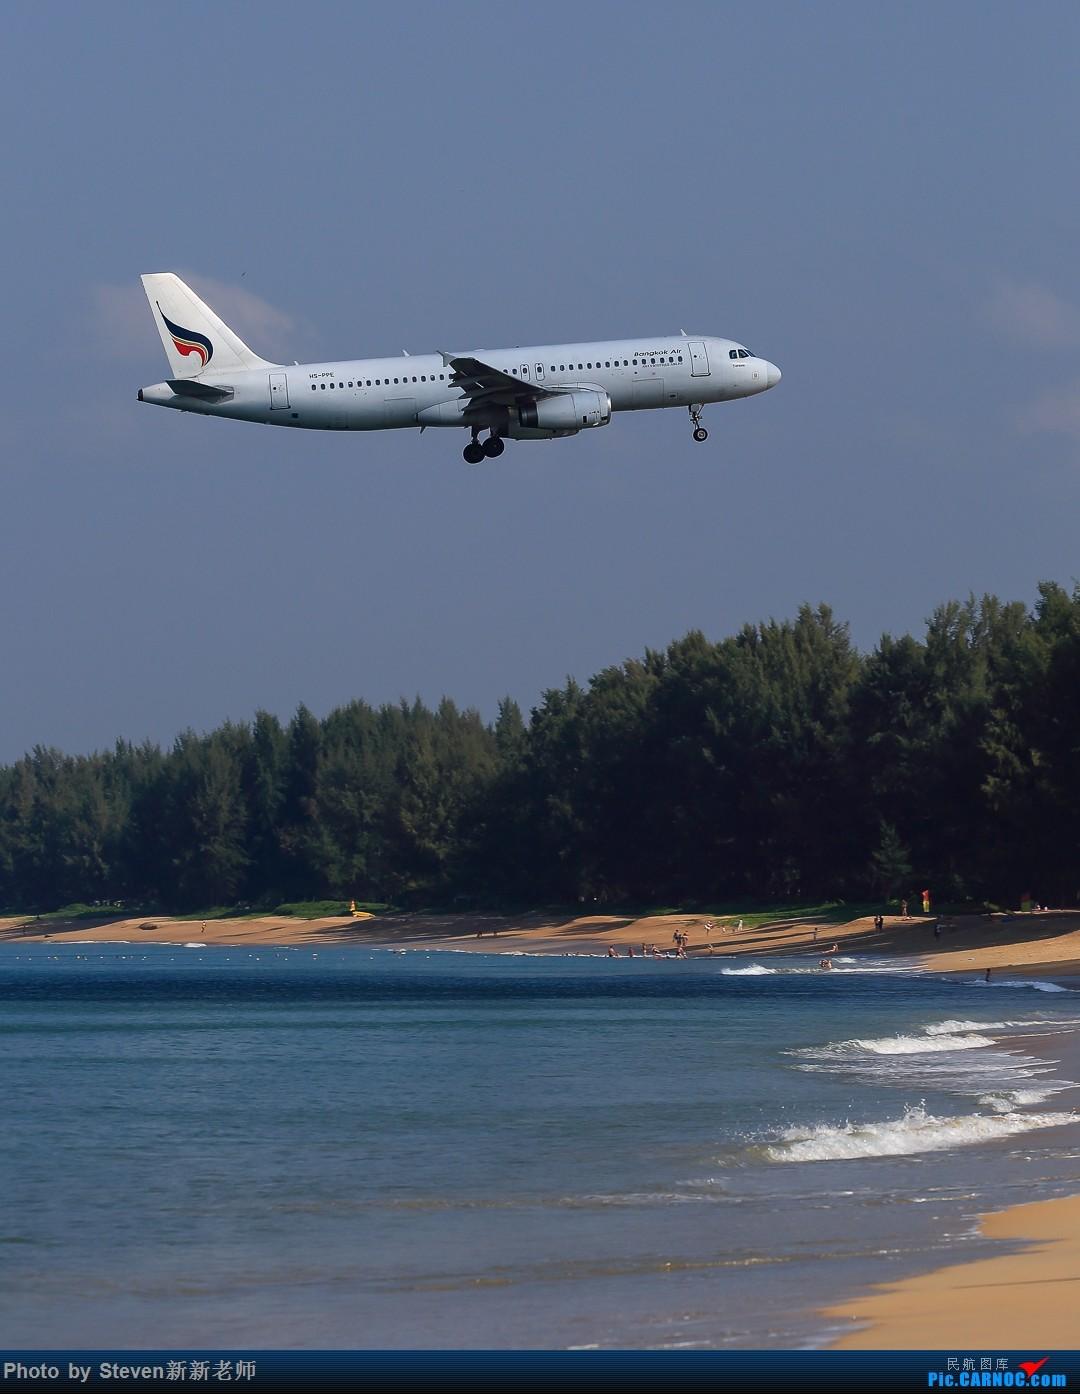 "Re:[原创]亚洲""圣马丁岛""—普吉国际机场拍机 AIRBUS A320-200 HS-PPE 泰国普吉机场"